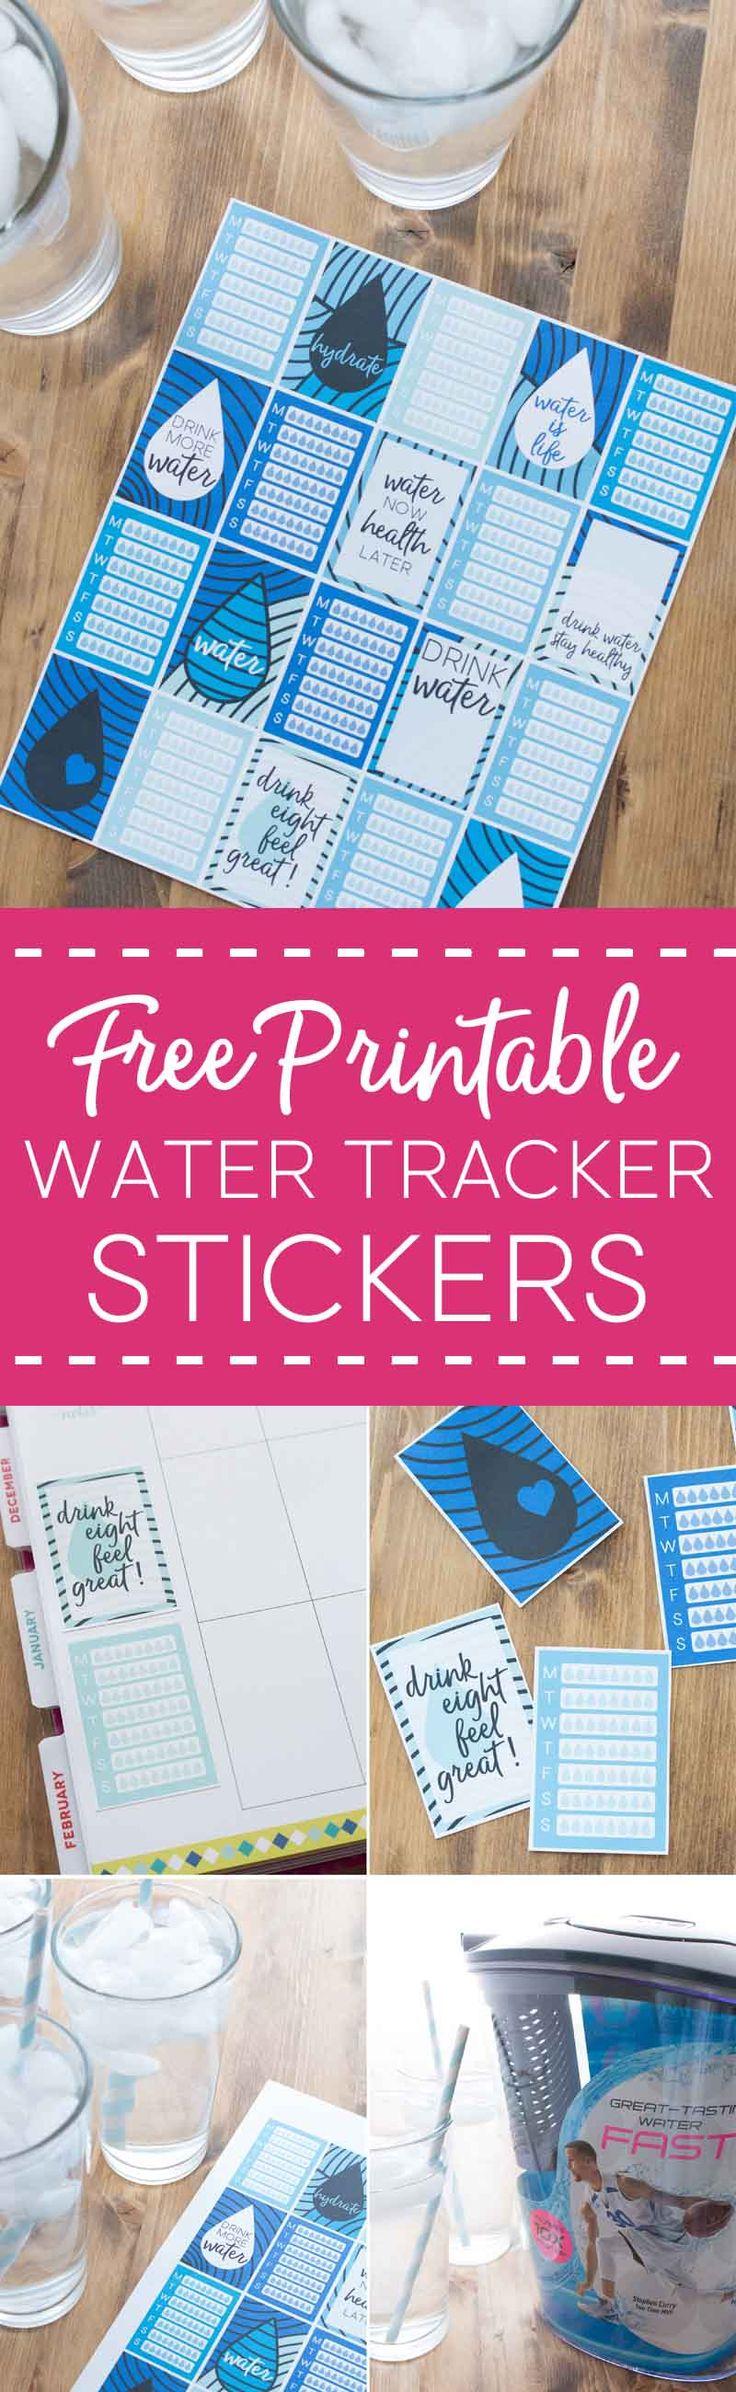 free printable water tracker stickers, happy planner stickers, water stickers, how to drink more water,  #ad via @brendidblog